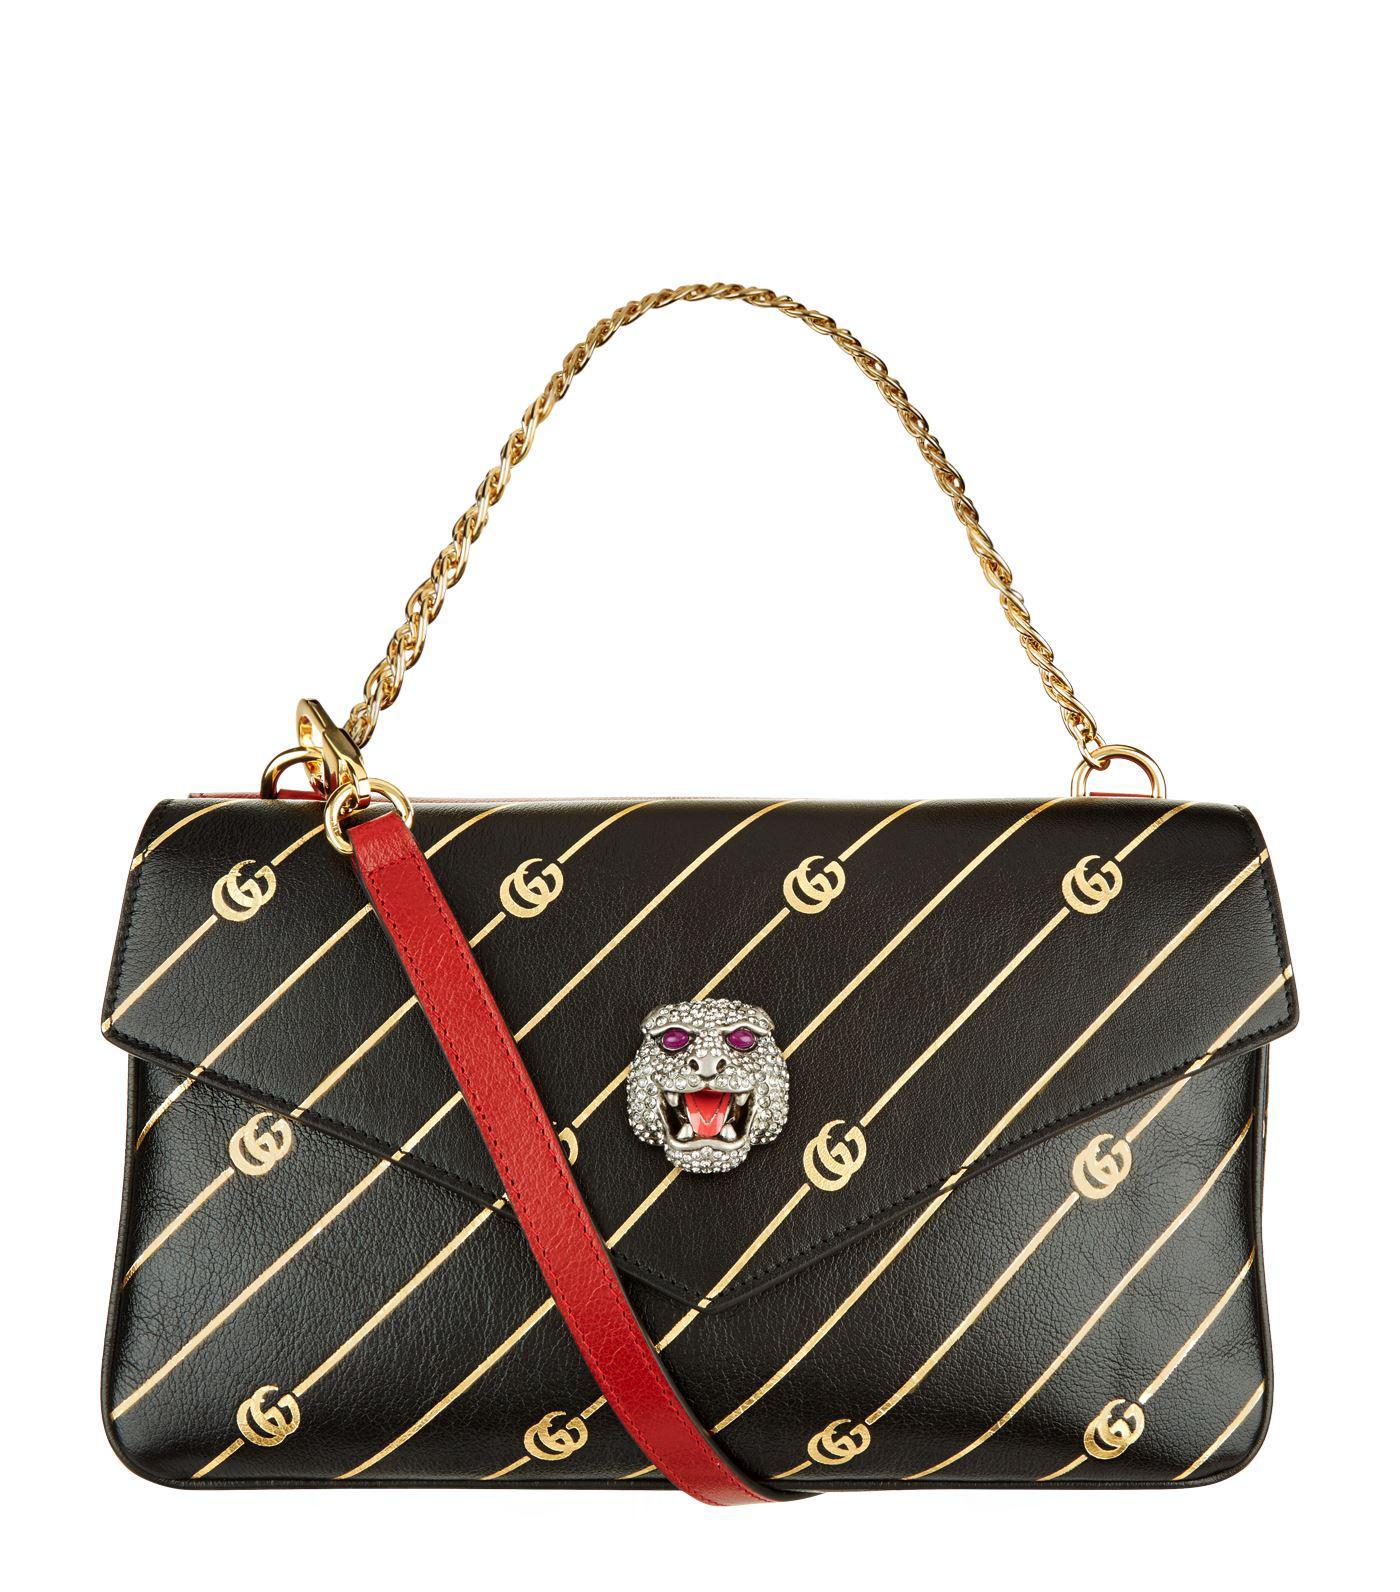 3ff711c9239b Gucci. Women's Thiara Leather Double Shoulder Bag